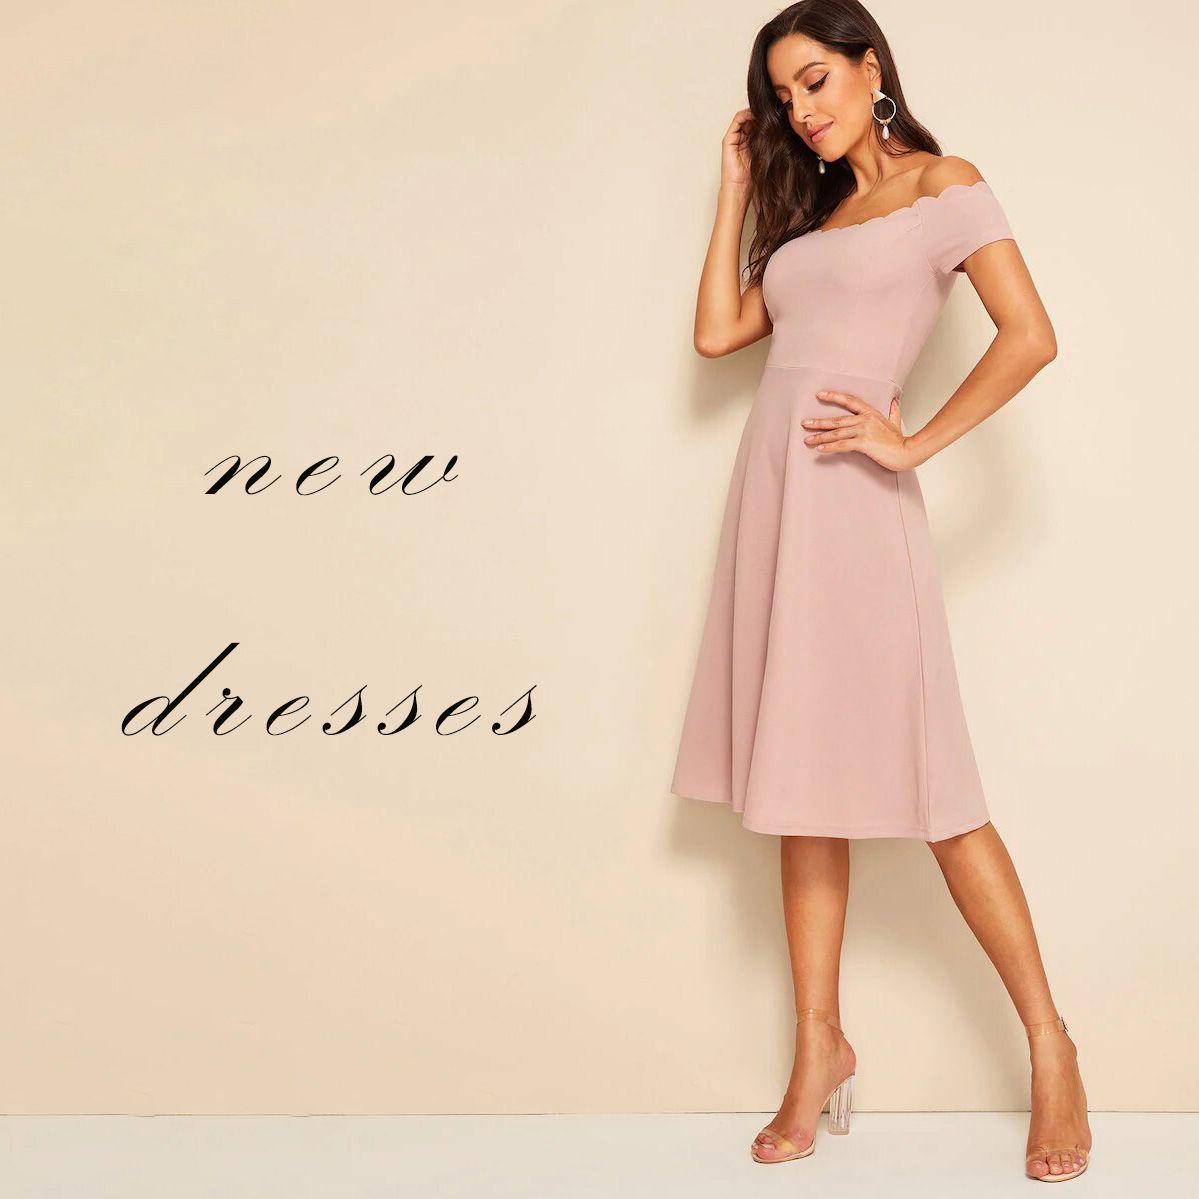 مظهرك اكثر انوثه بهذا الفستان تلاقينه بقسم الفساتين Sh C10074 فستان فساتين ملابس نسائيه Dresses Fashion Clothes